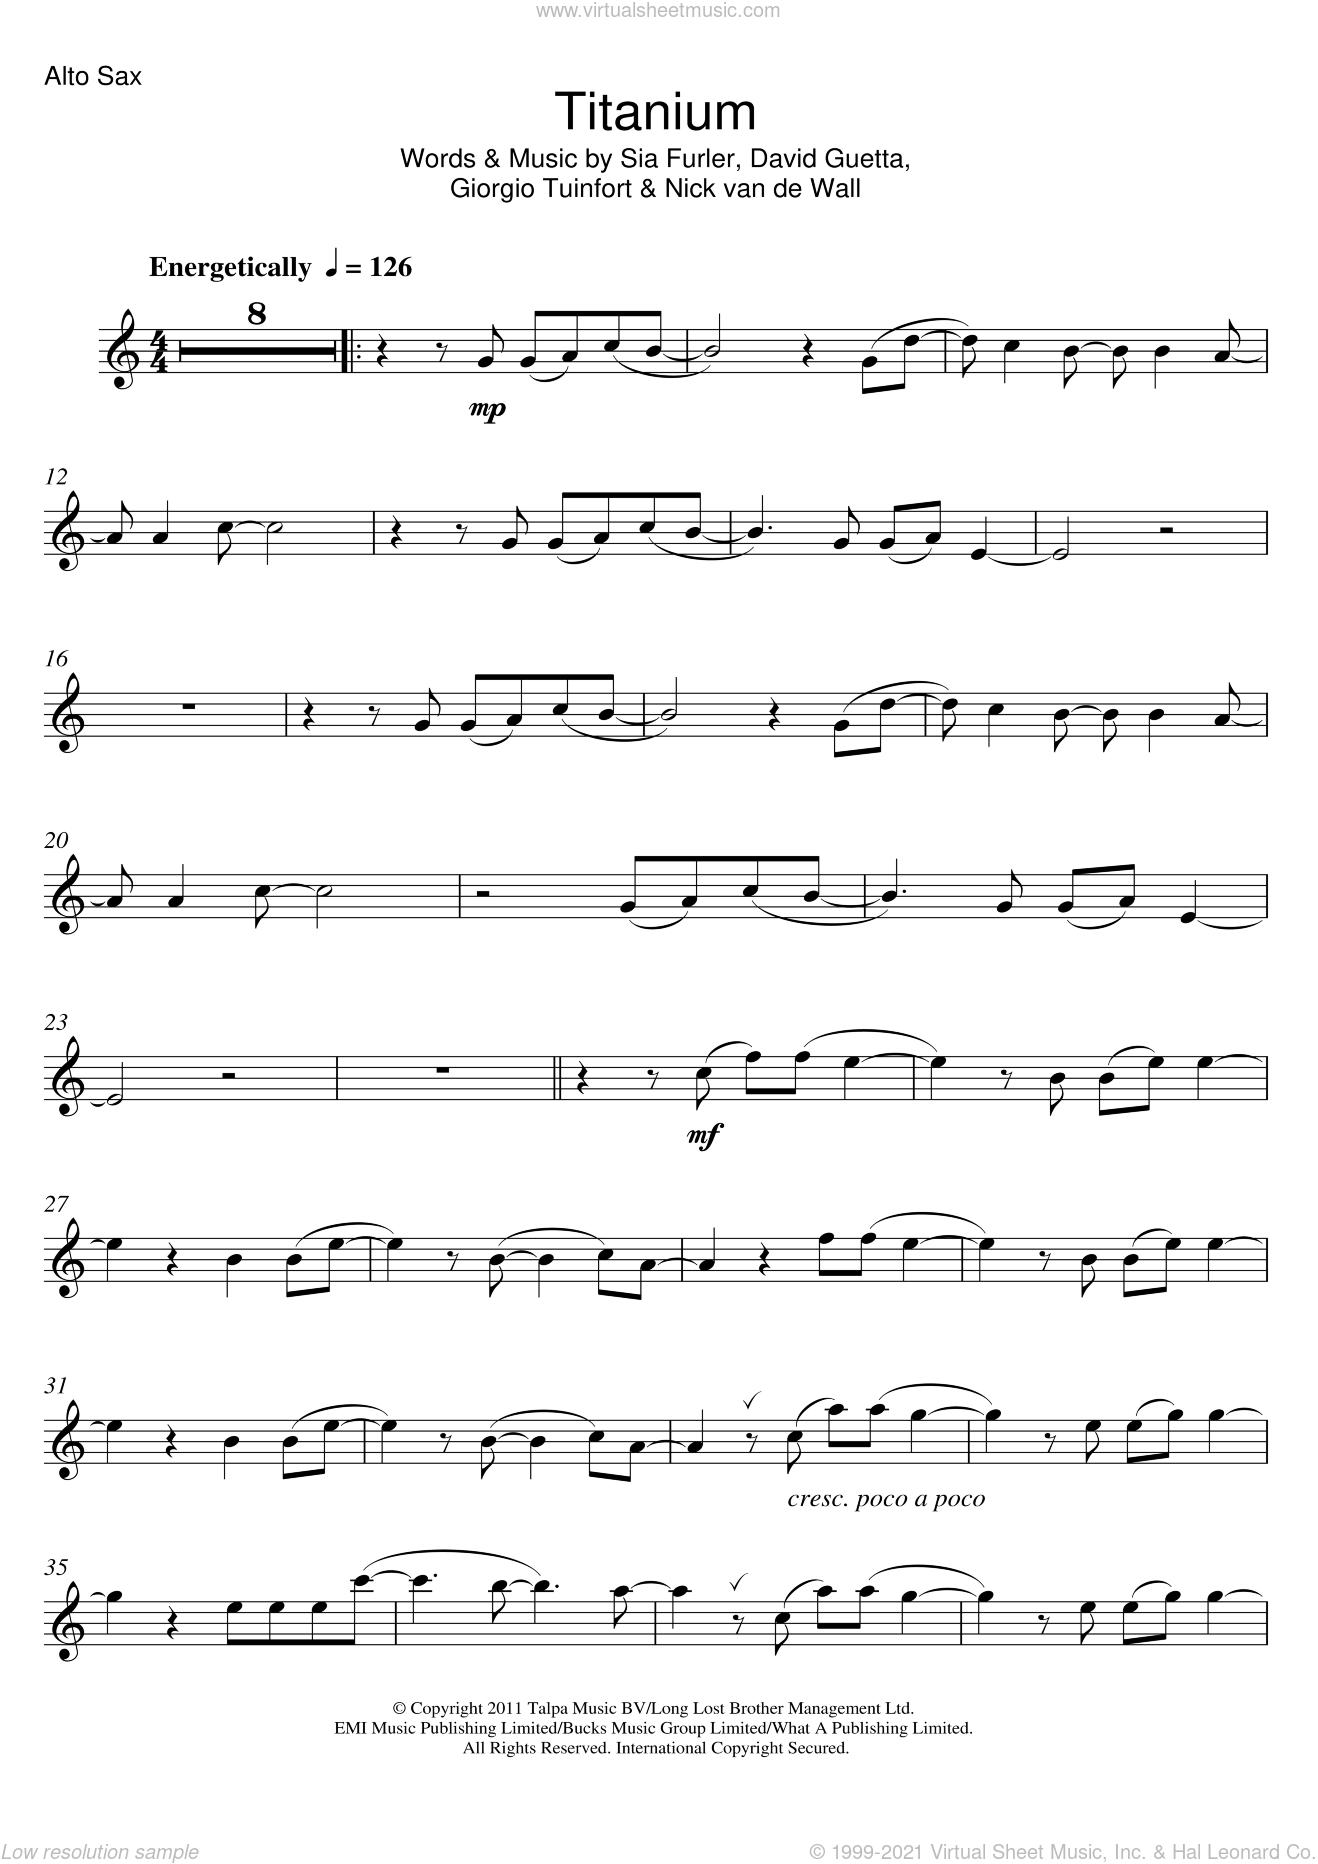 Titanium (feat. Sia) sheet music for alto saxophone solo by David Guetta, Sia, Giorgio Tuinfort, Nick van de Wall and Sia Furler, intermediate skill level